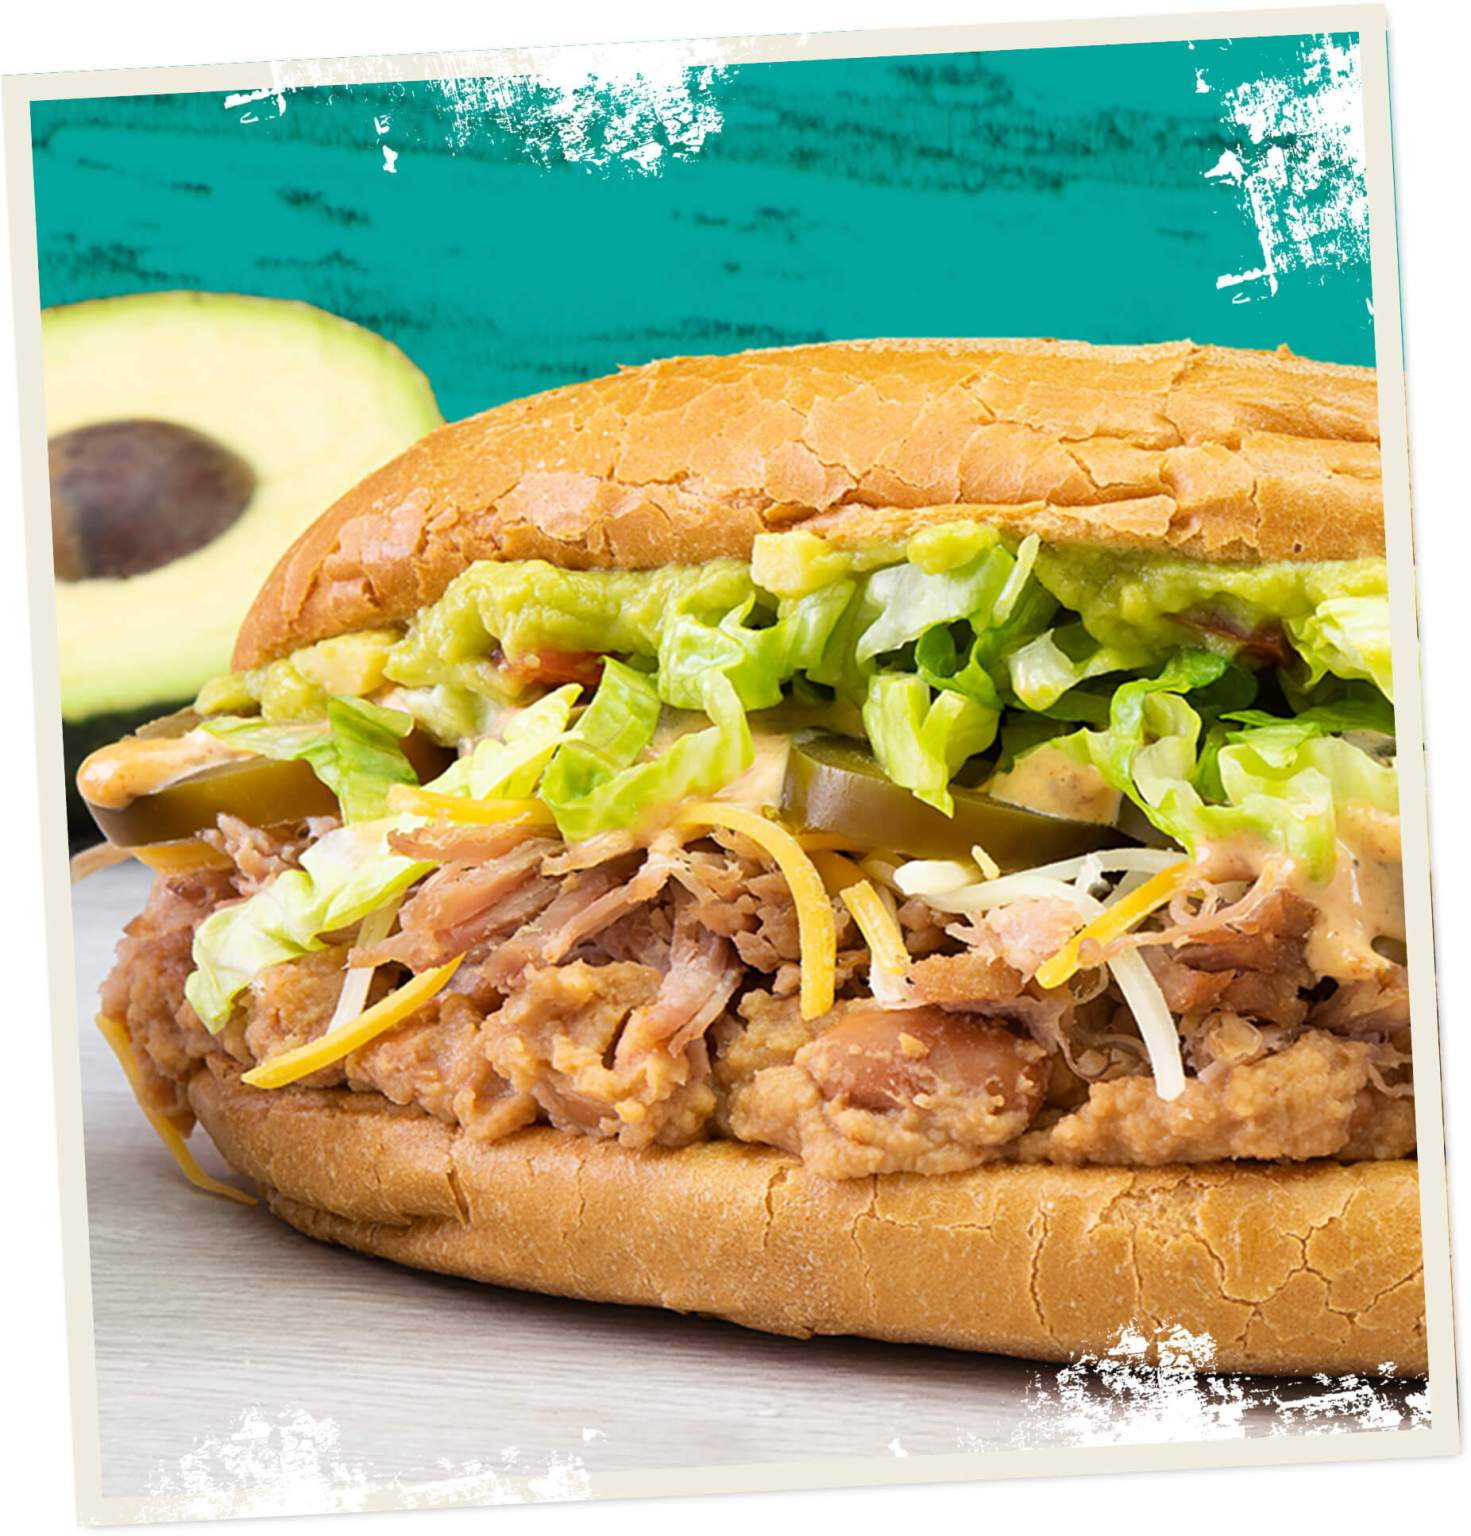 Mexican Torta Sandwich